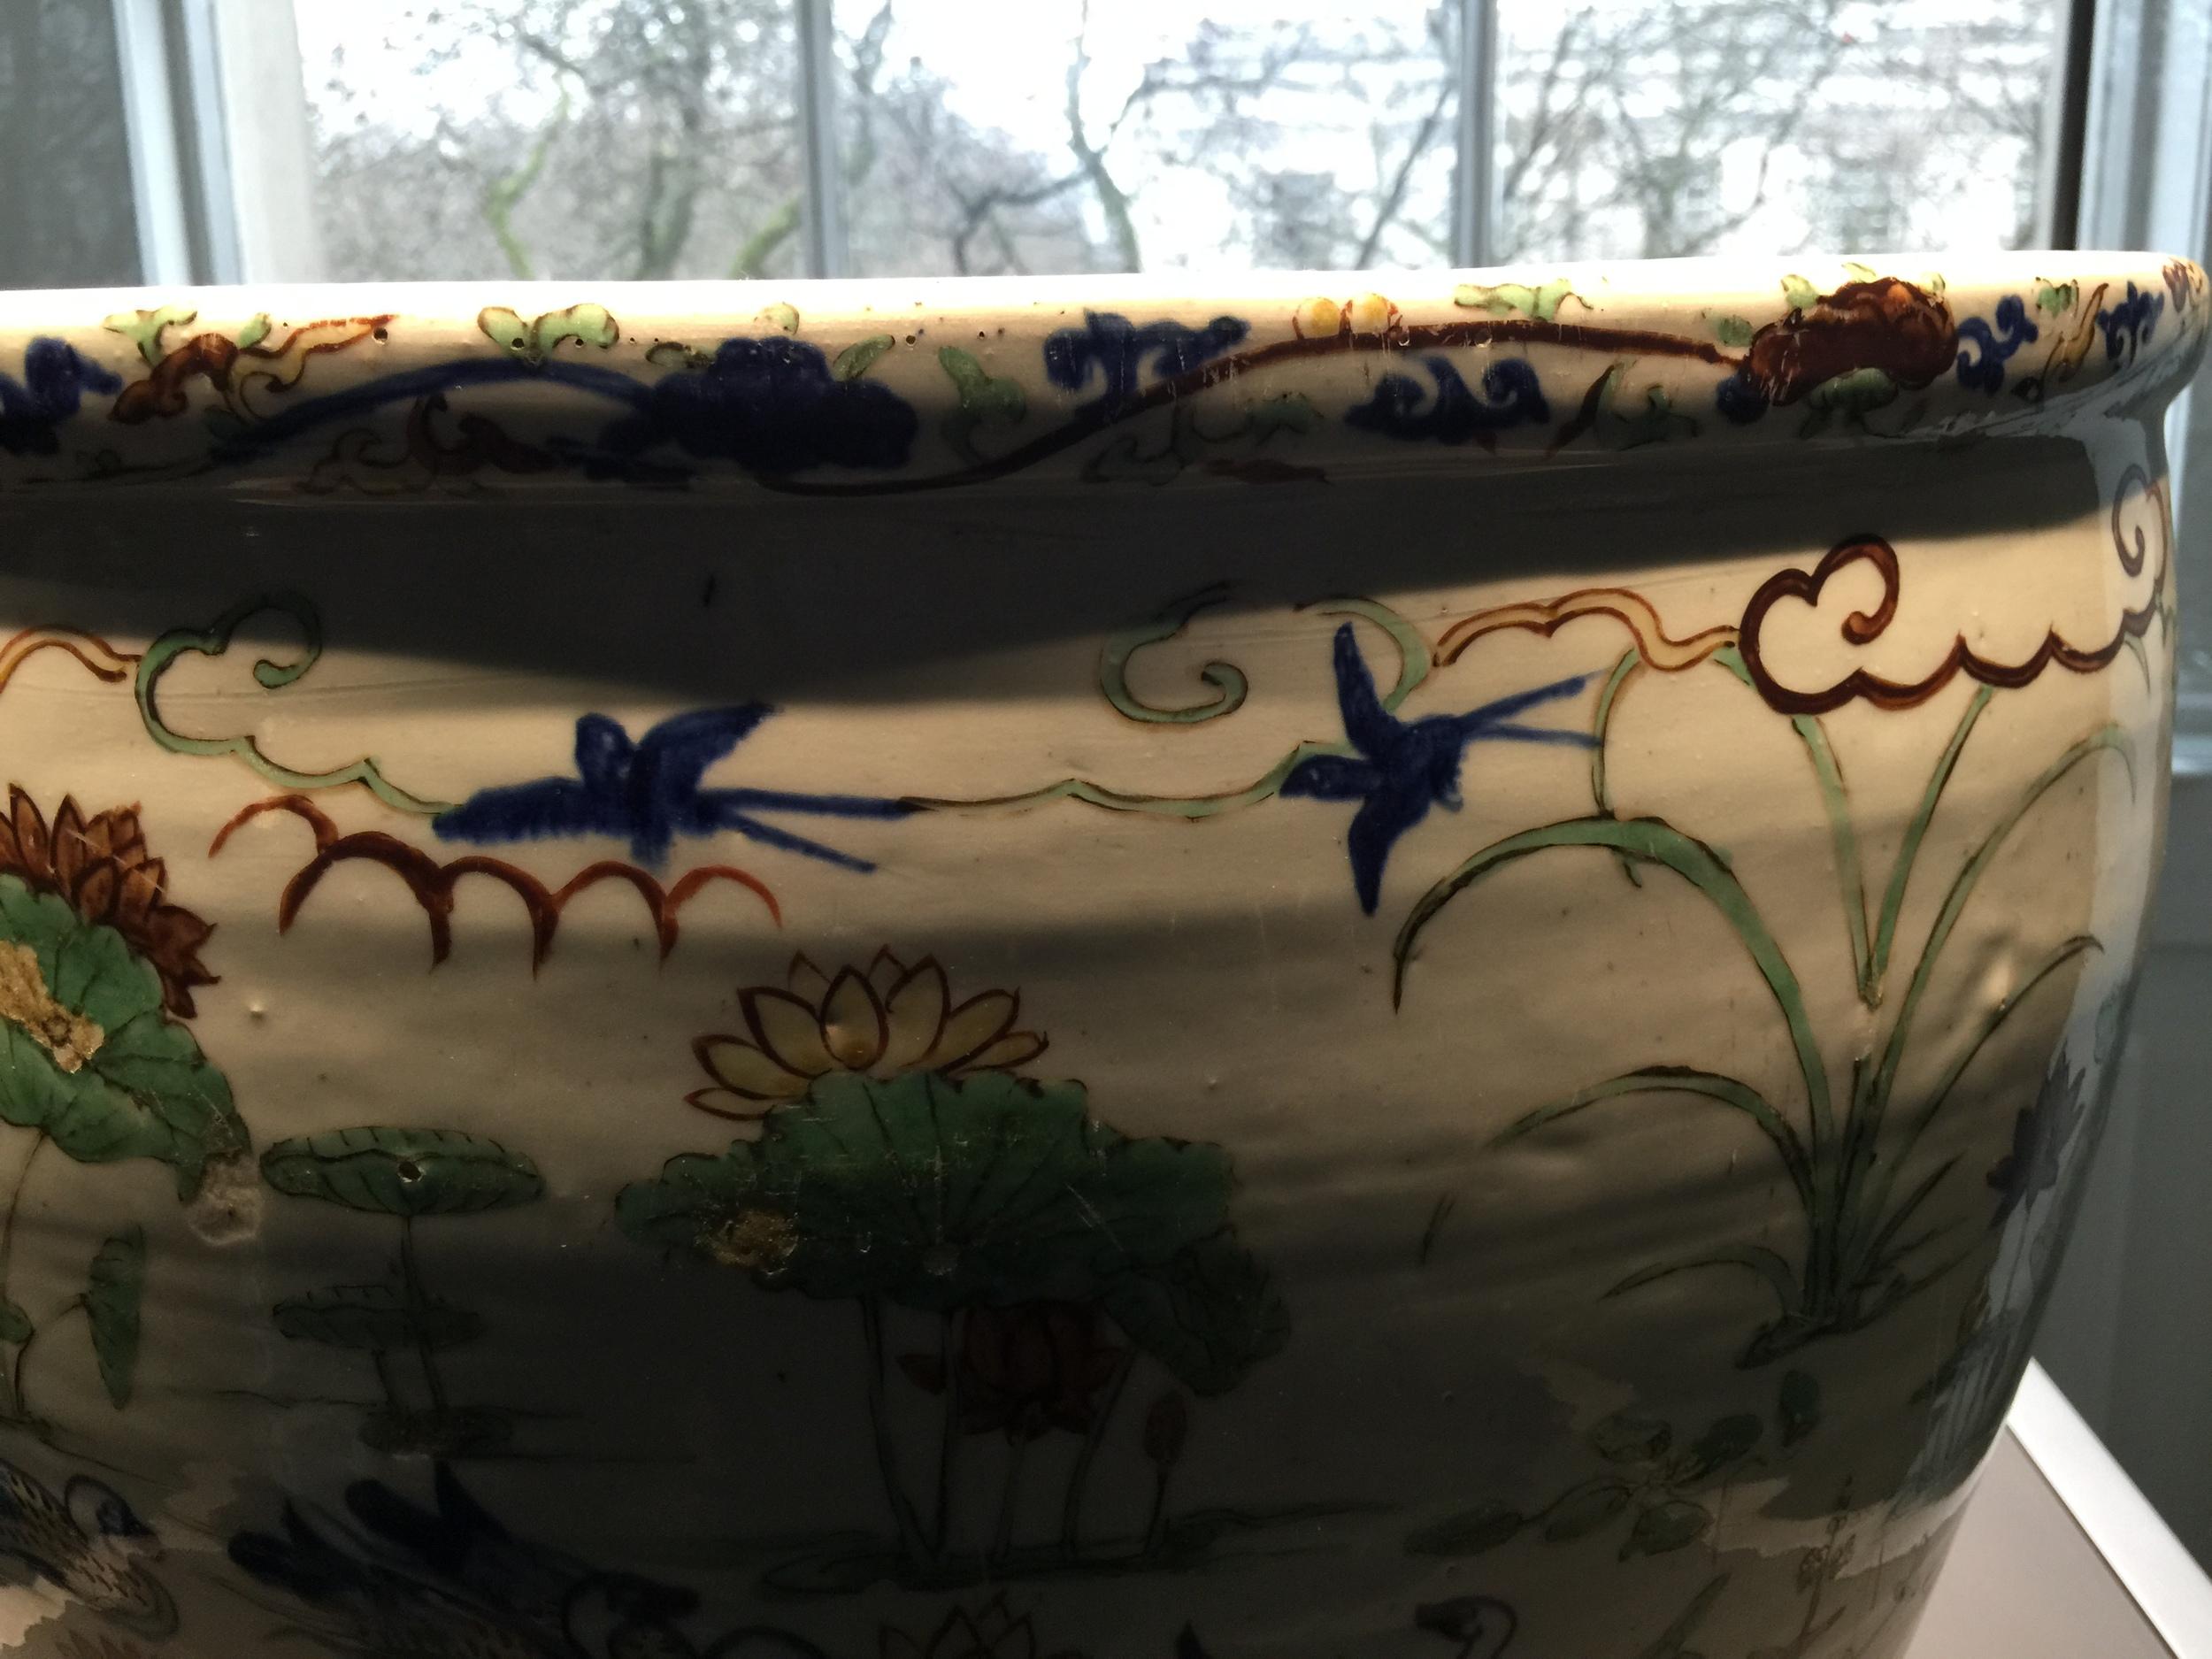 Chinese-Porcelain-British-Museum-Percival-David-jessewaugh.com-32.jpg